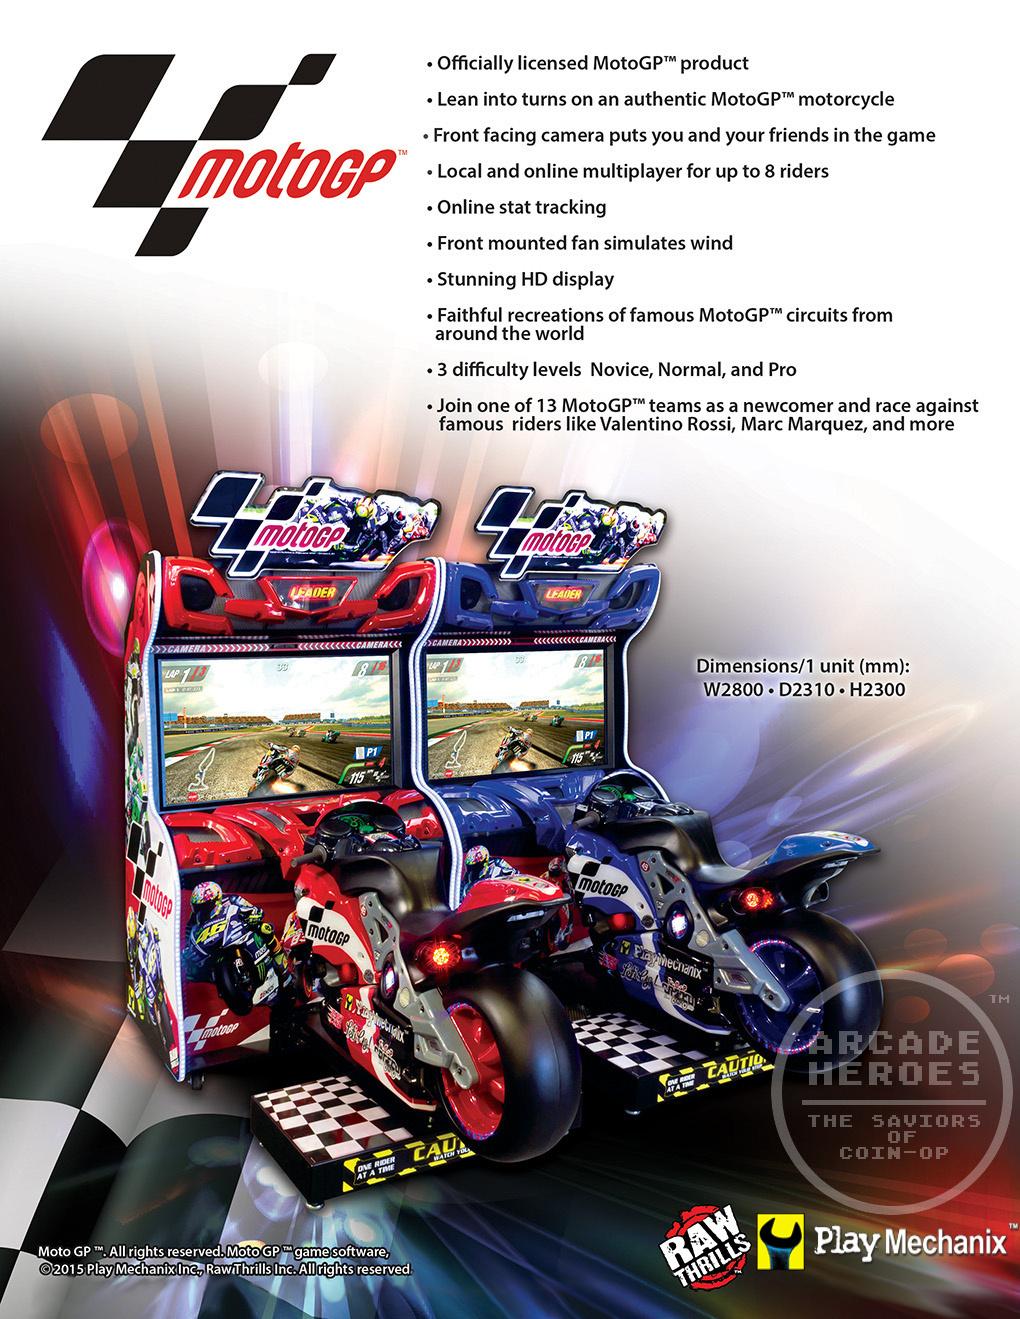 Arcade Heroes The Next Racing Game From Play Mechanix & Raw Thrills: MotoGP - Arcade Heroes